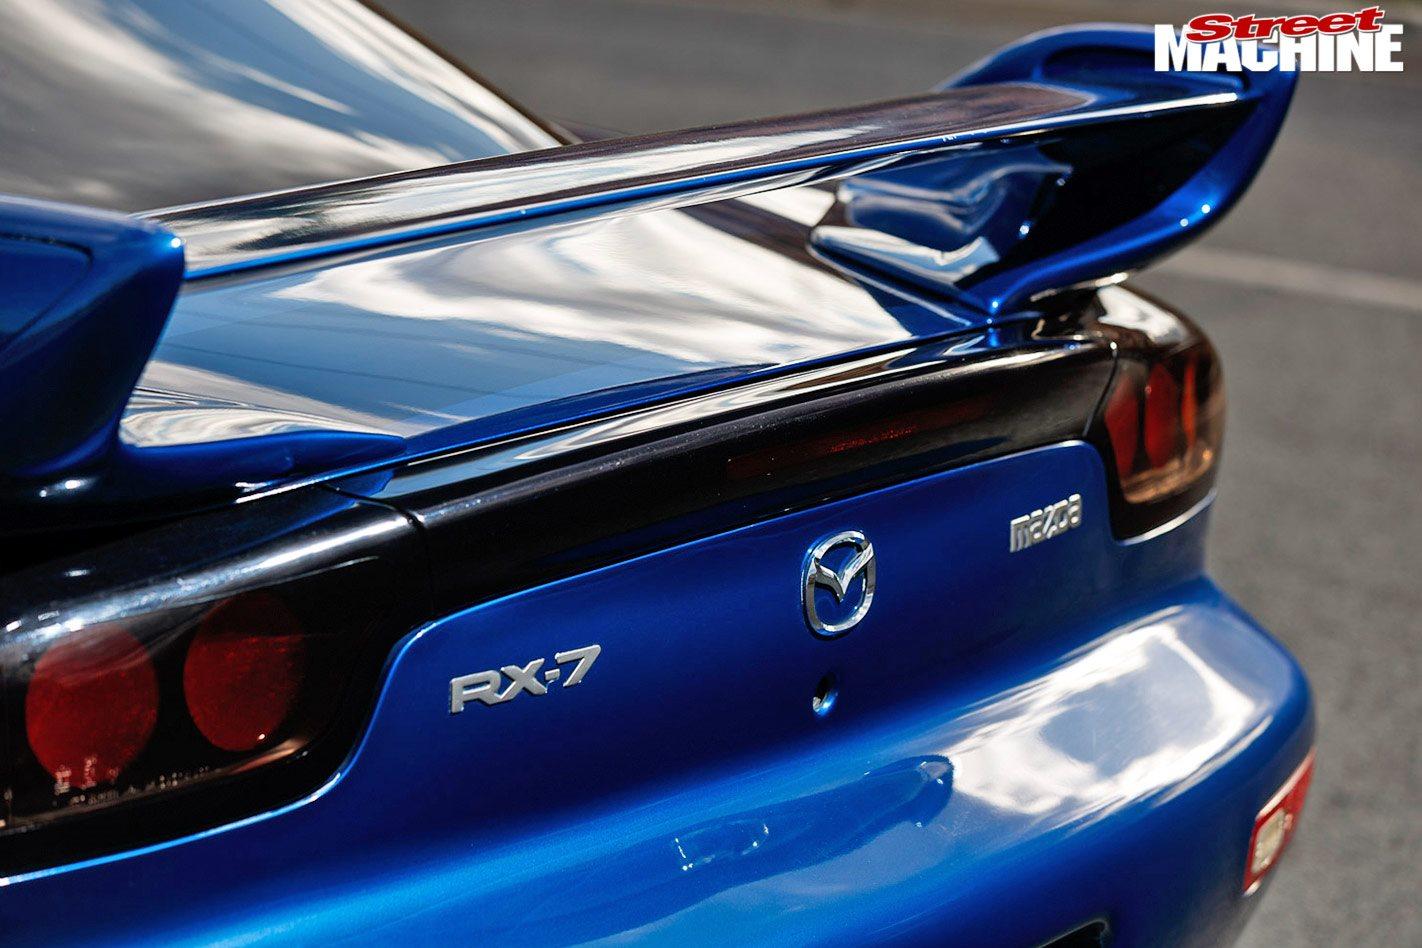 L98-powered Mazda RX-7